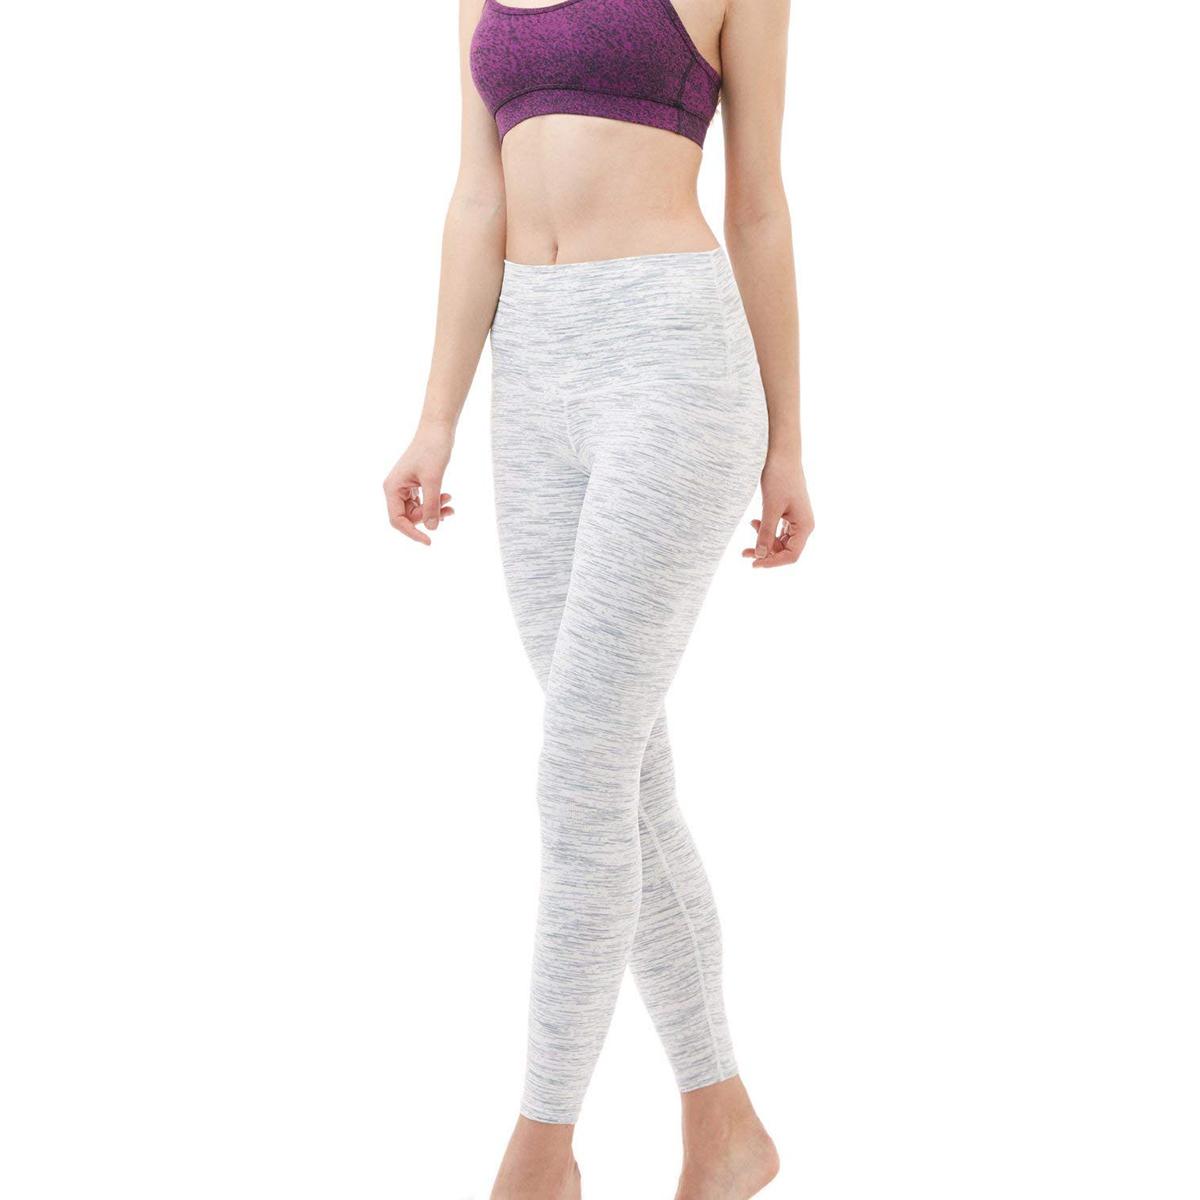 thumbnail 39 - TSLA Tesla FYP52 Women's High-Waisted Ultra-Stretch Tummy Control Yoga Pants